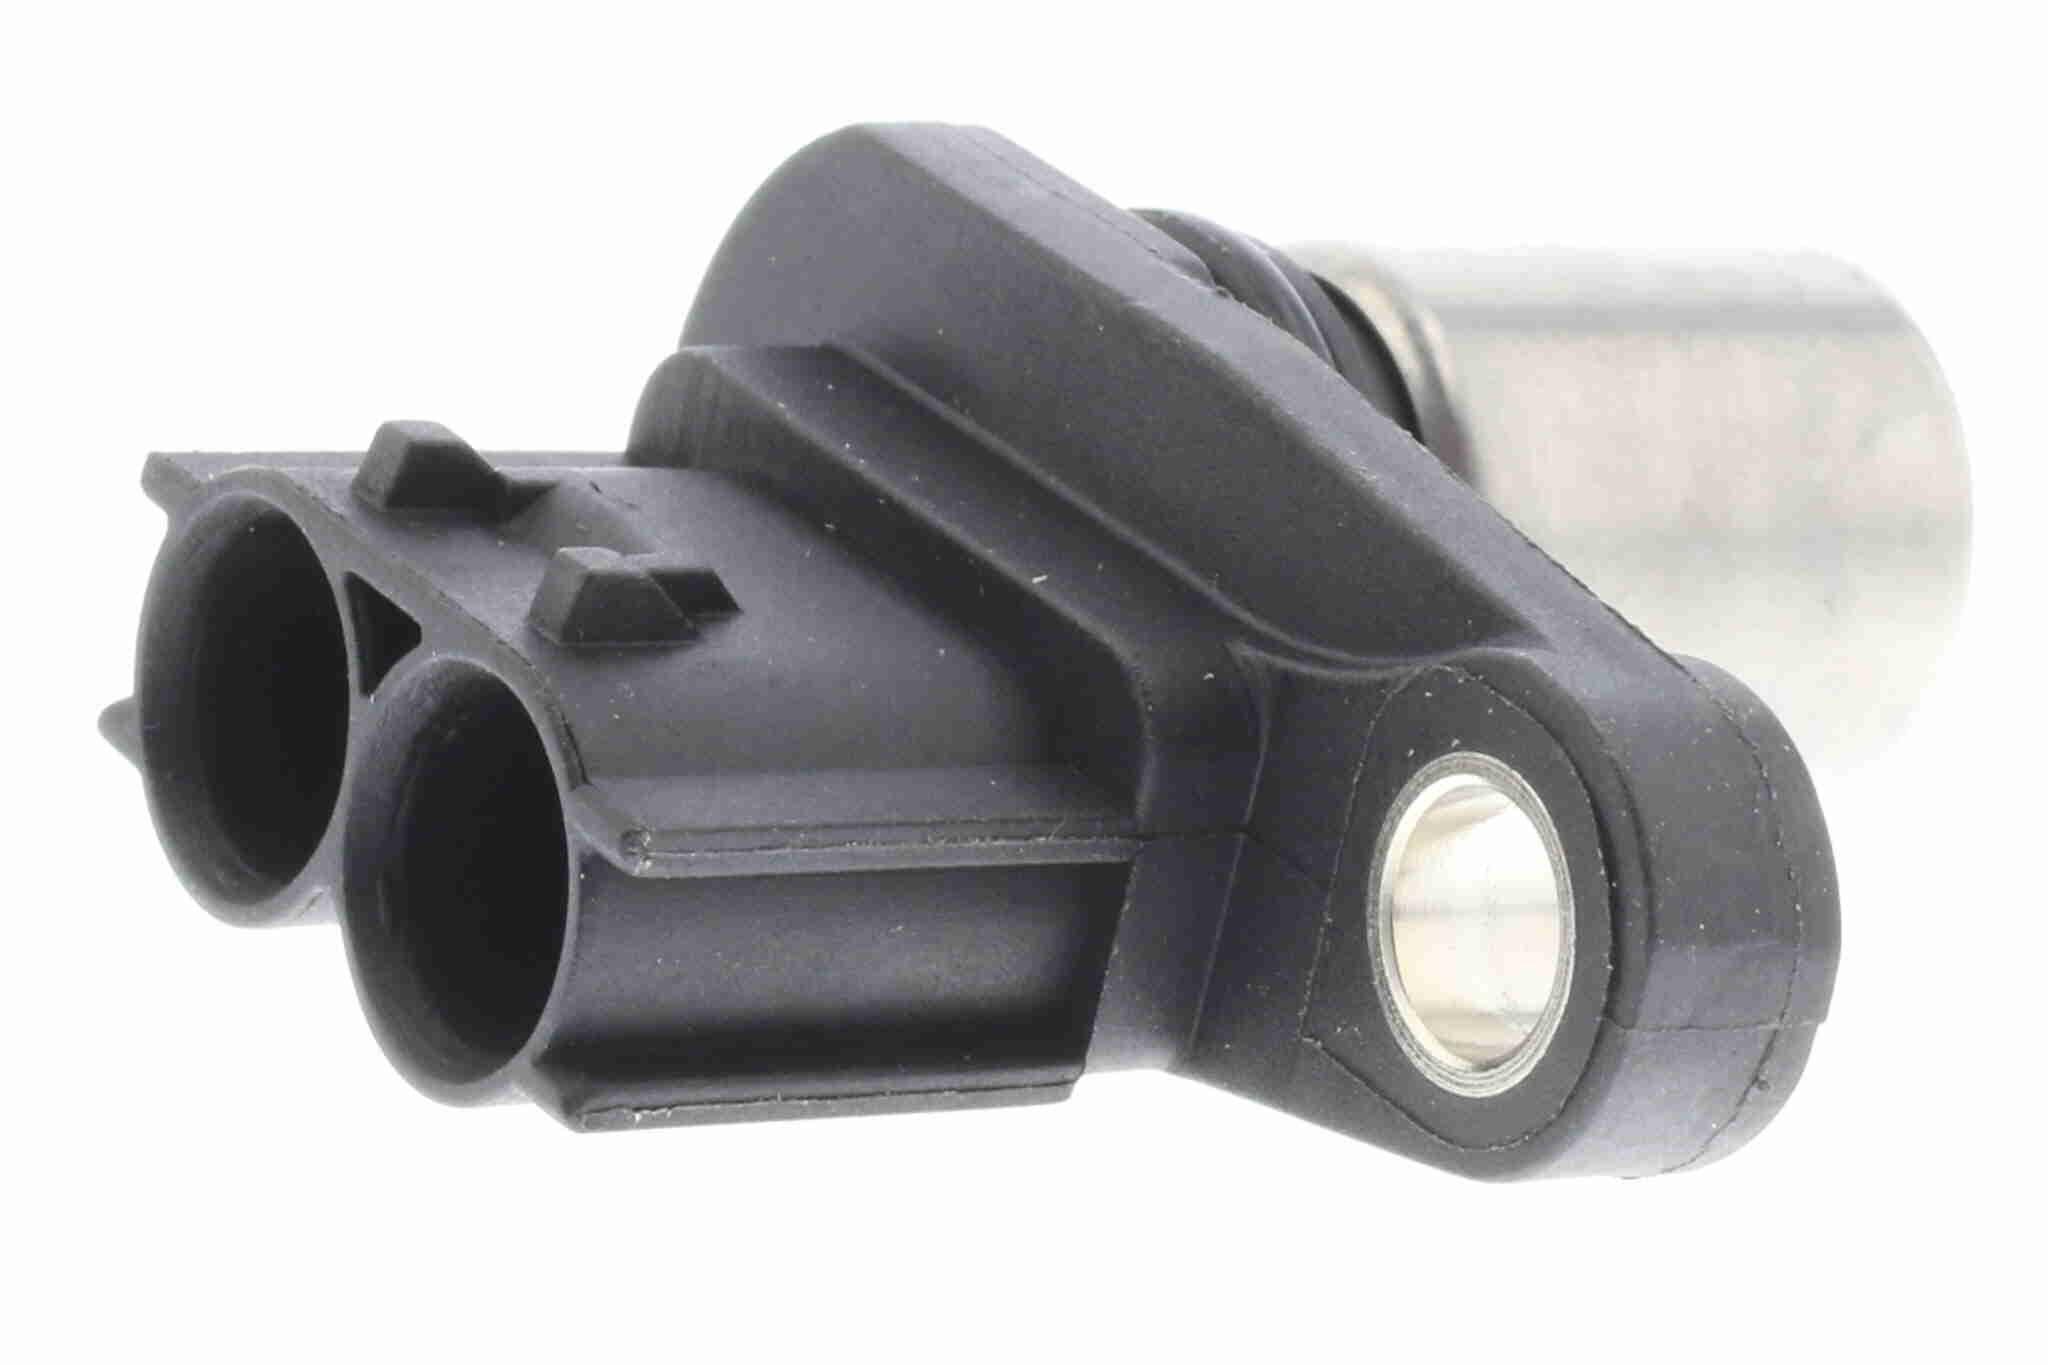 VEMO: Original Ot Geber V70-72-0251 (Anschlussanzahl: 2, Pol-Anzahl: 2-polig)